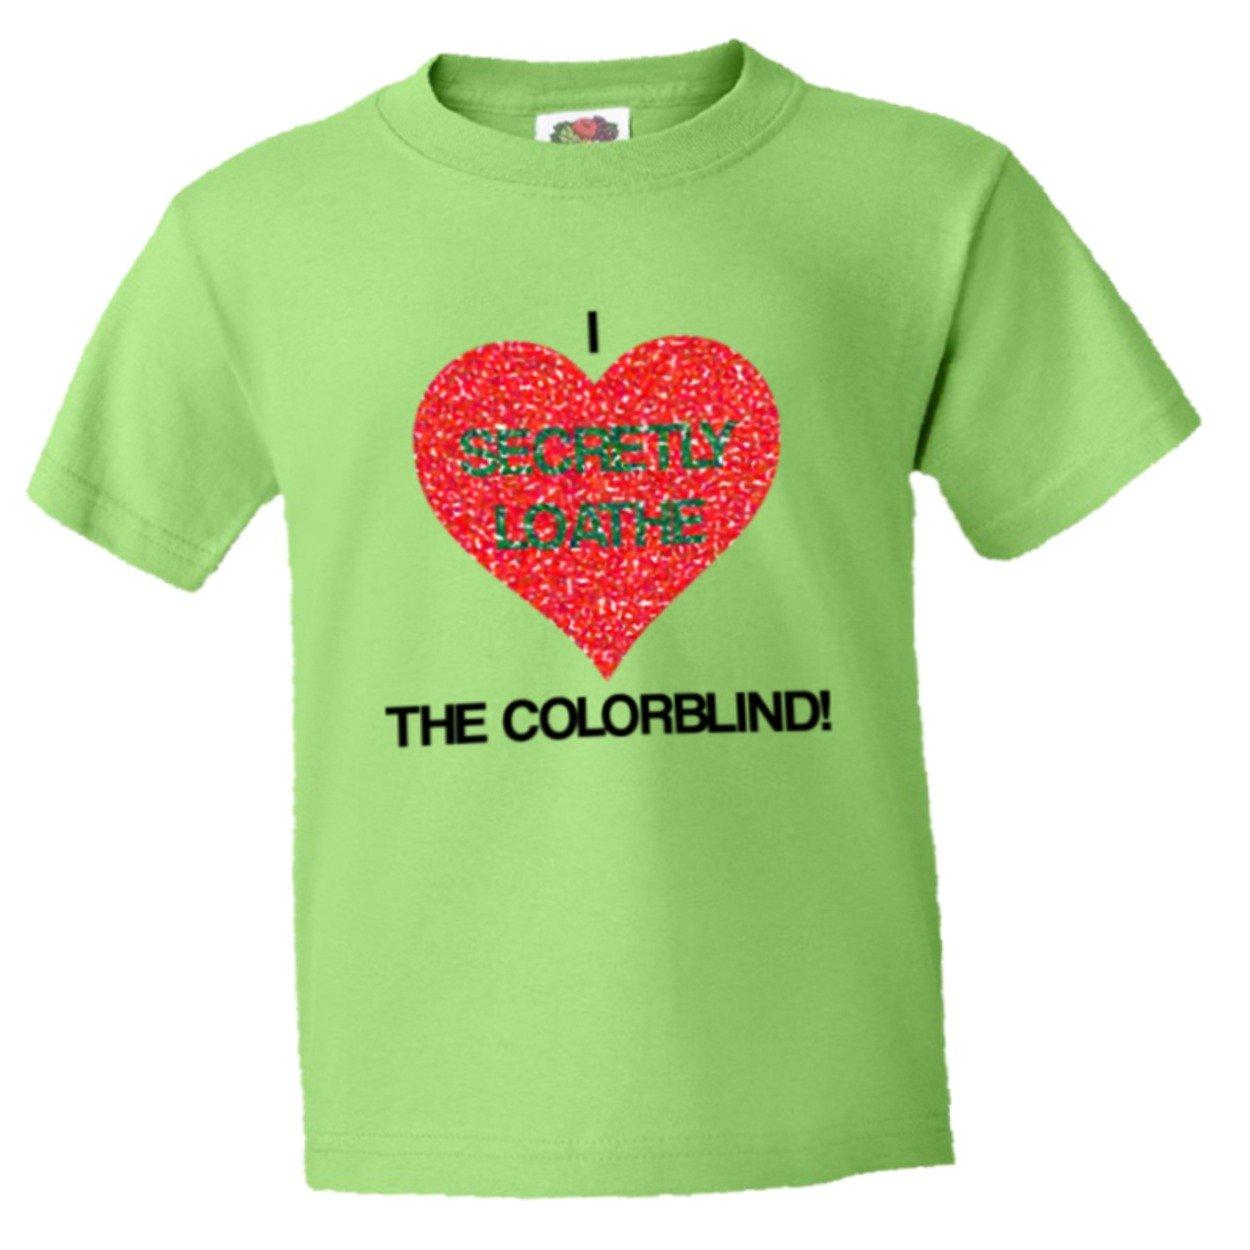 Amazon.com: PleaseMeTees Youth I Secretly Loathe Hate The Colorblind ...